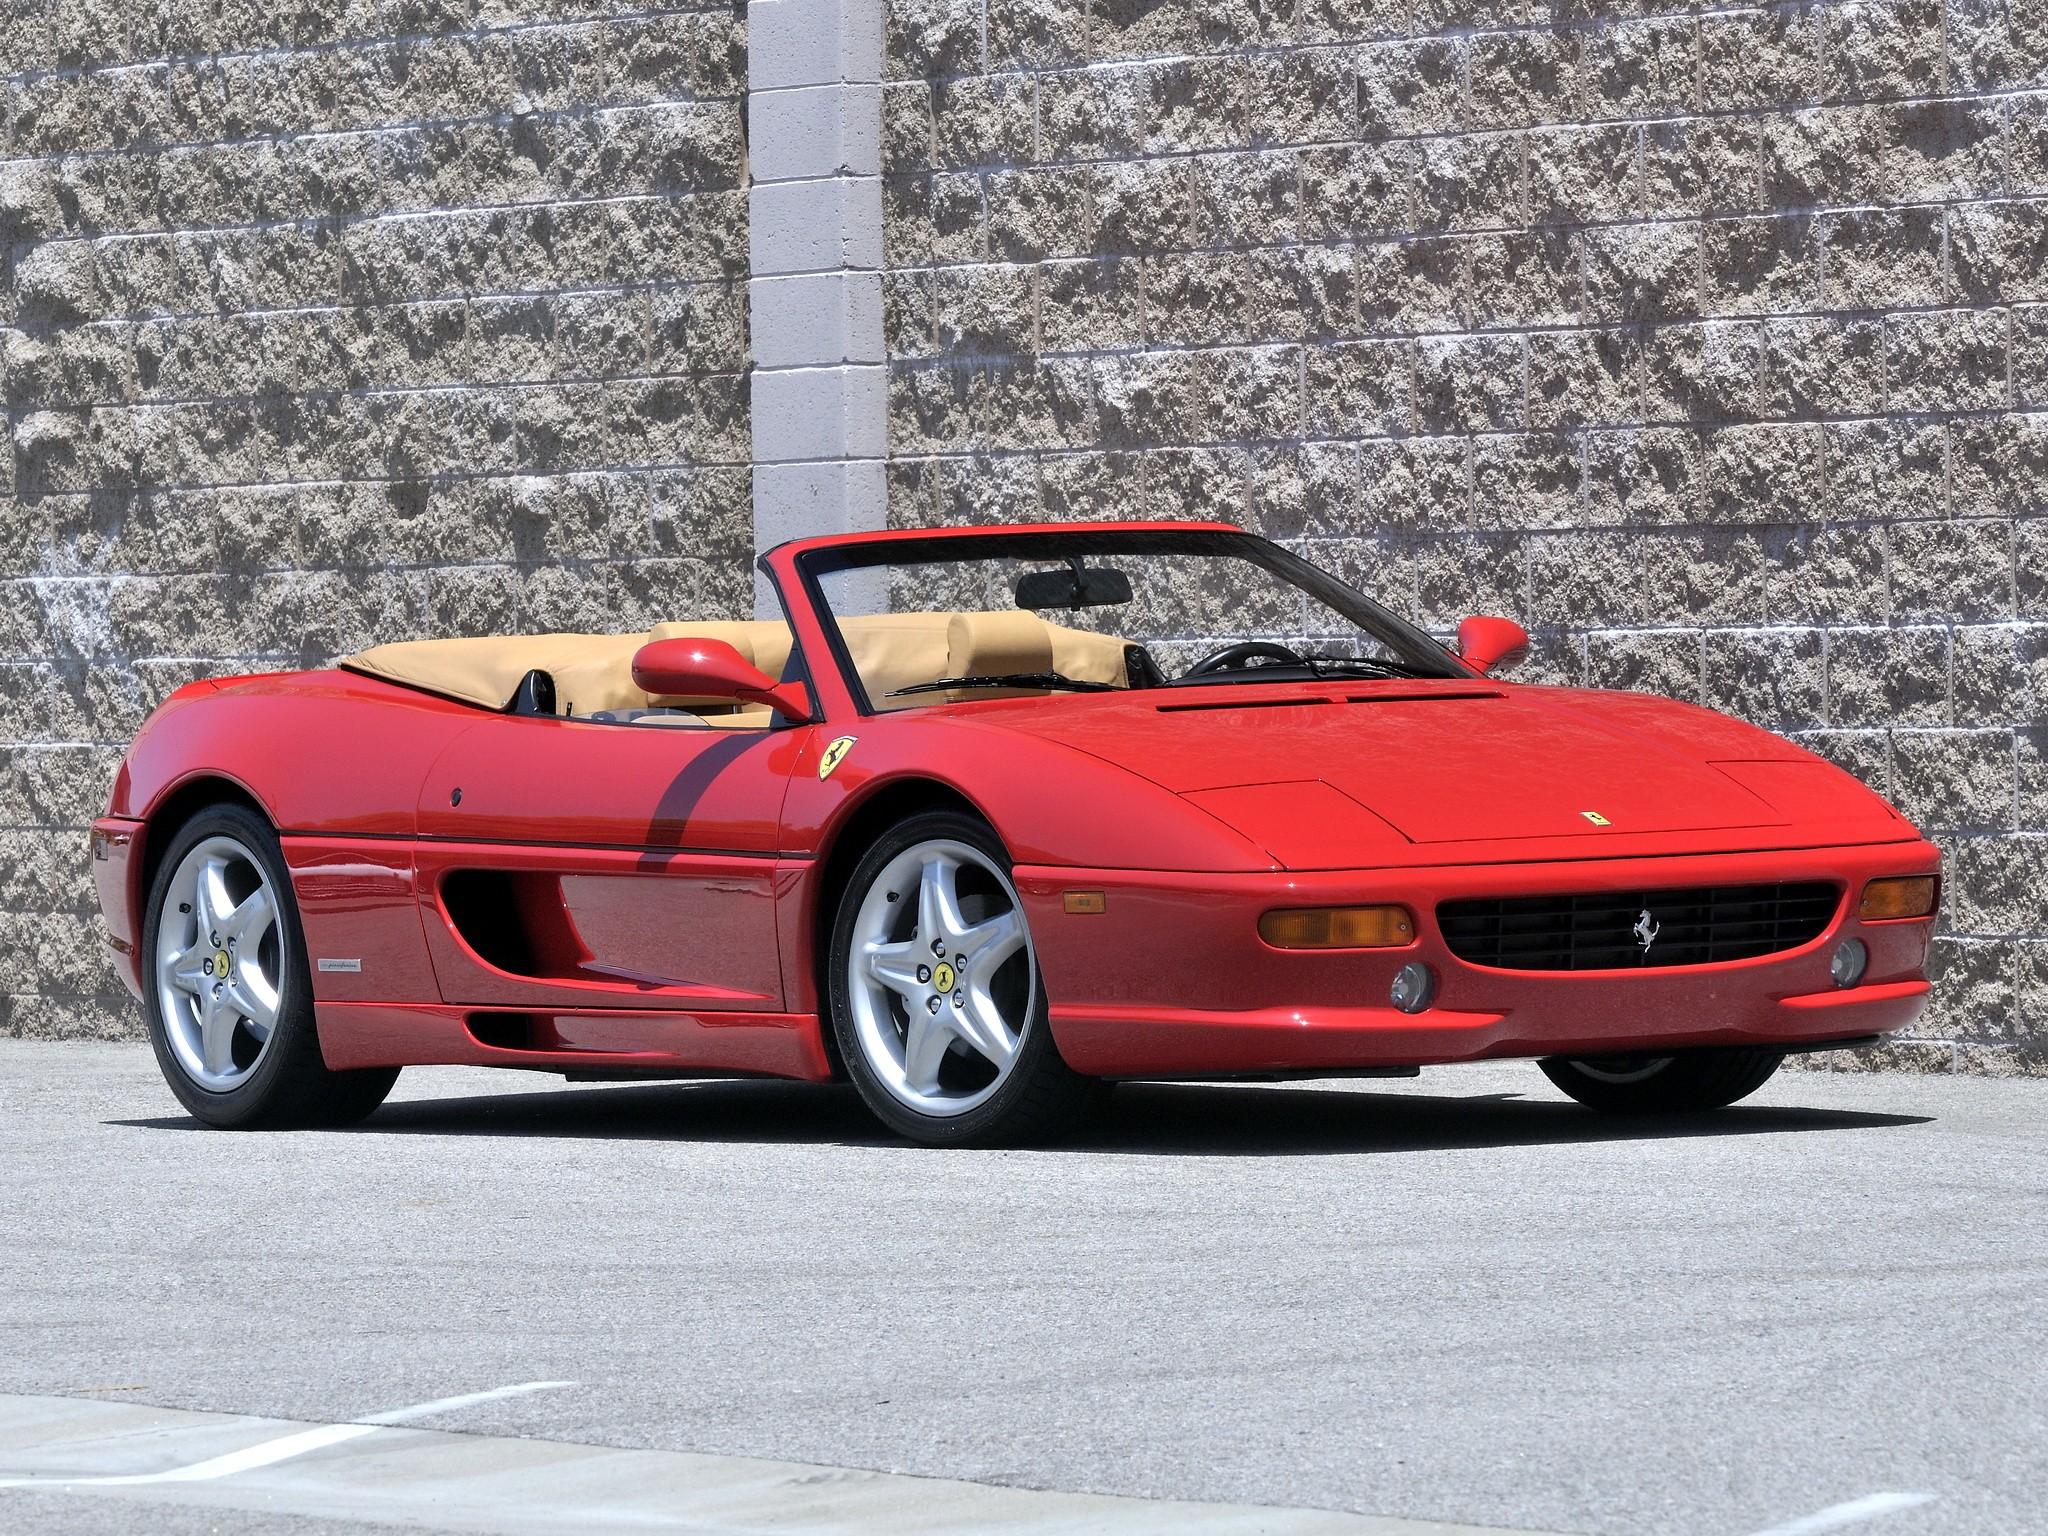 Ferrari Brochures Literature Memorabilia Manuals and